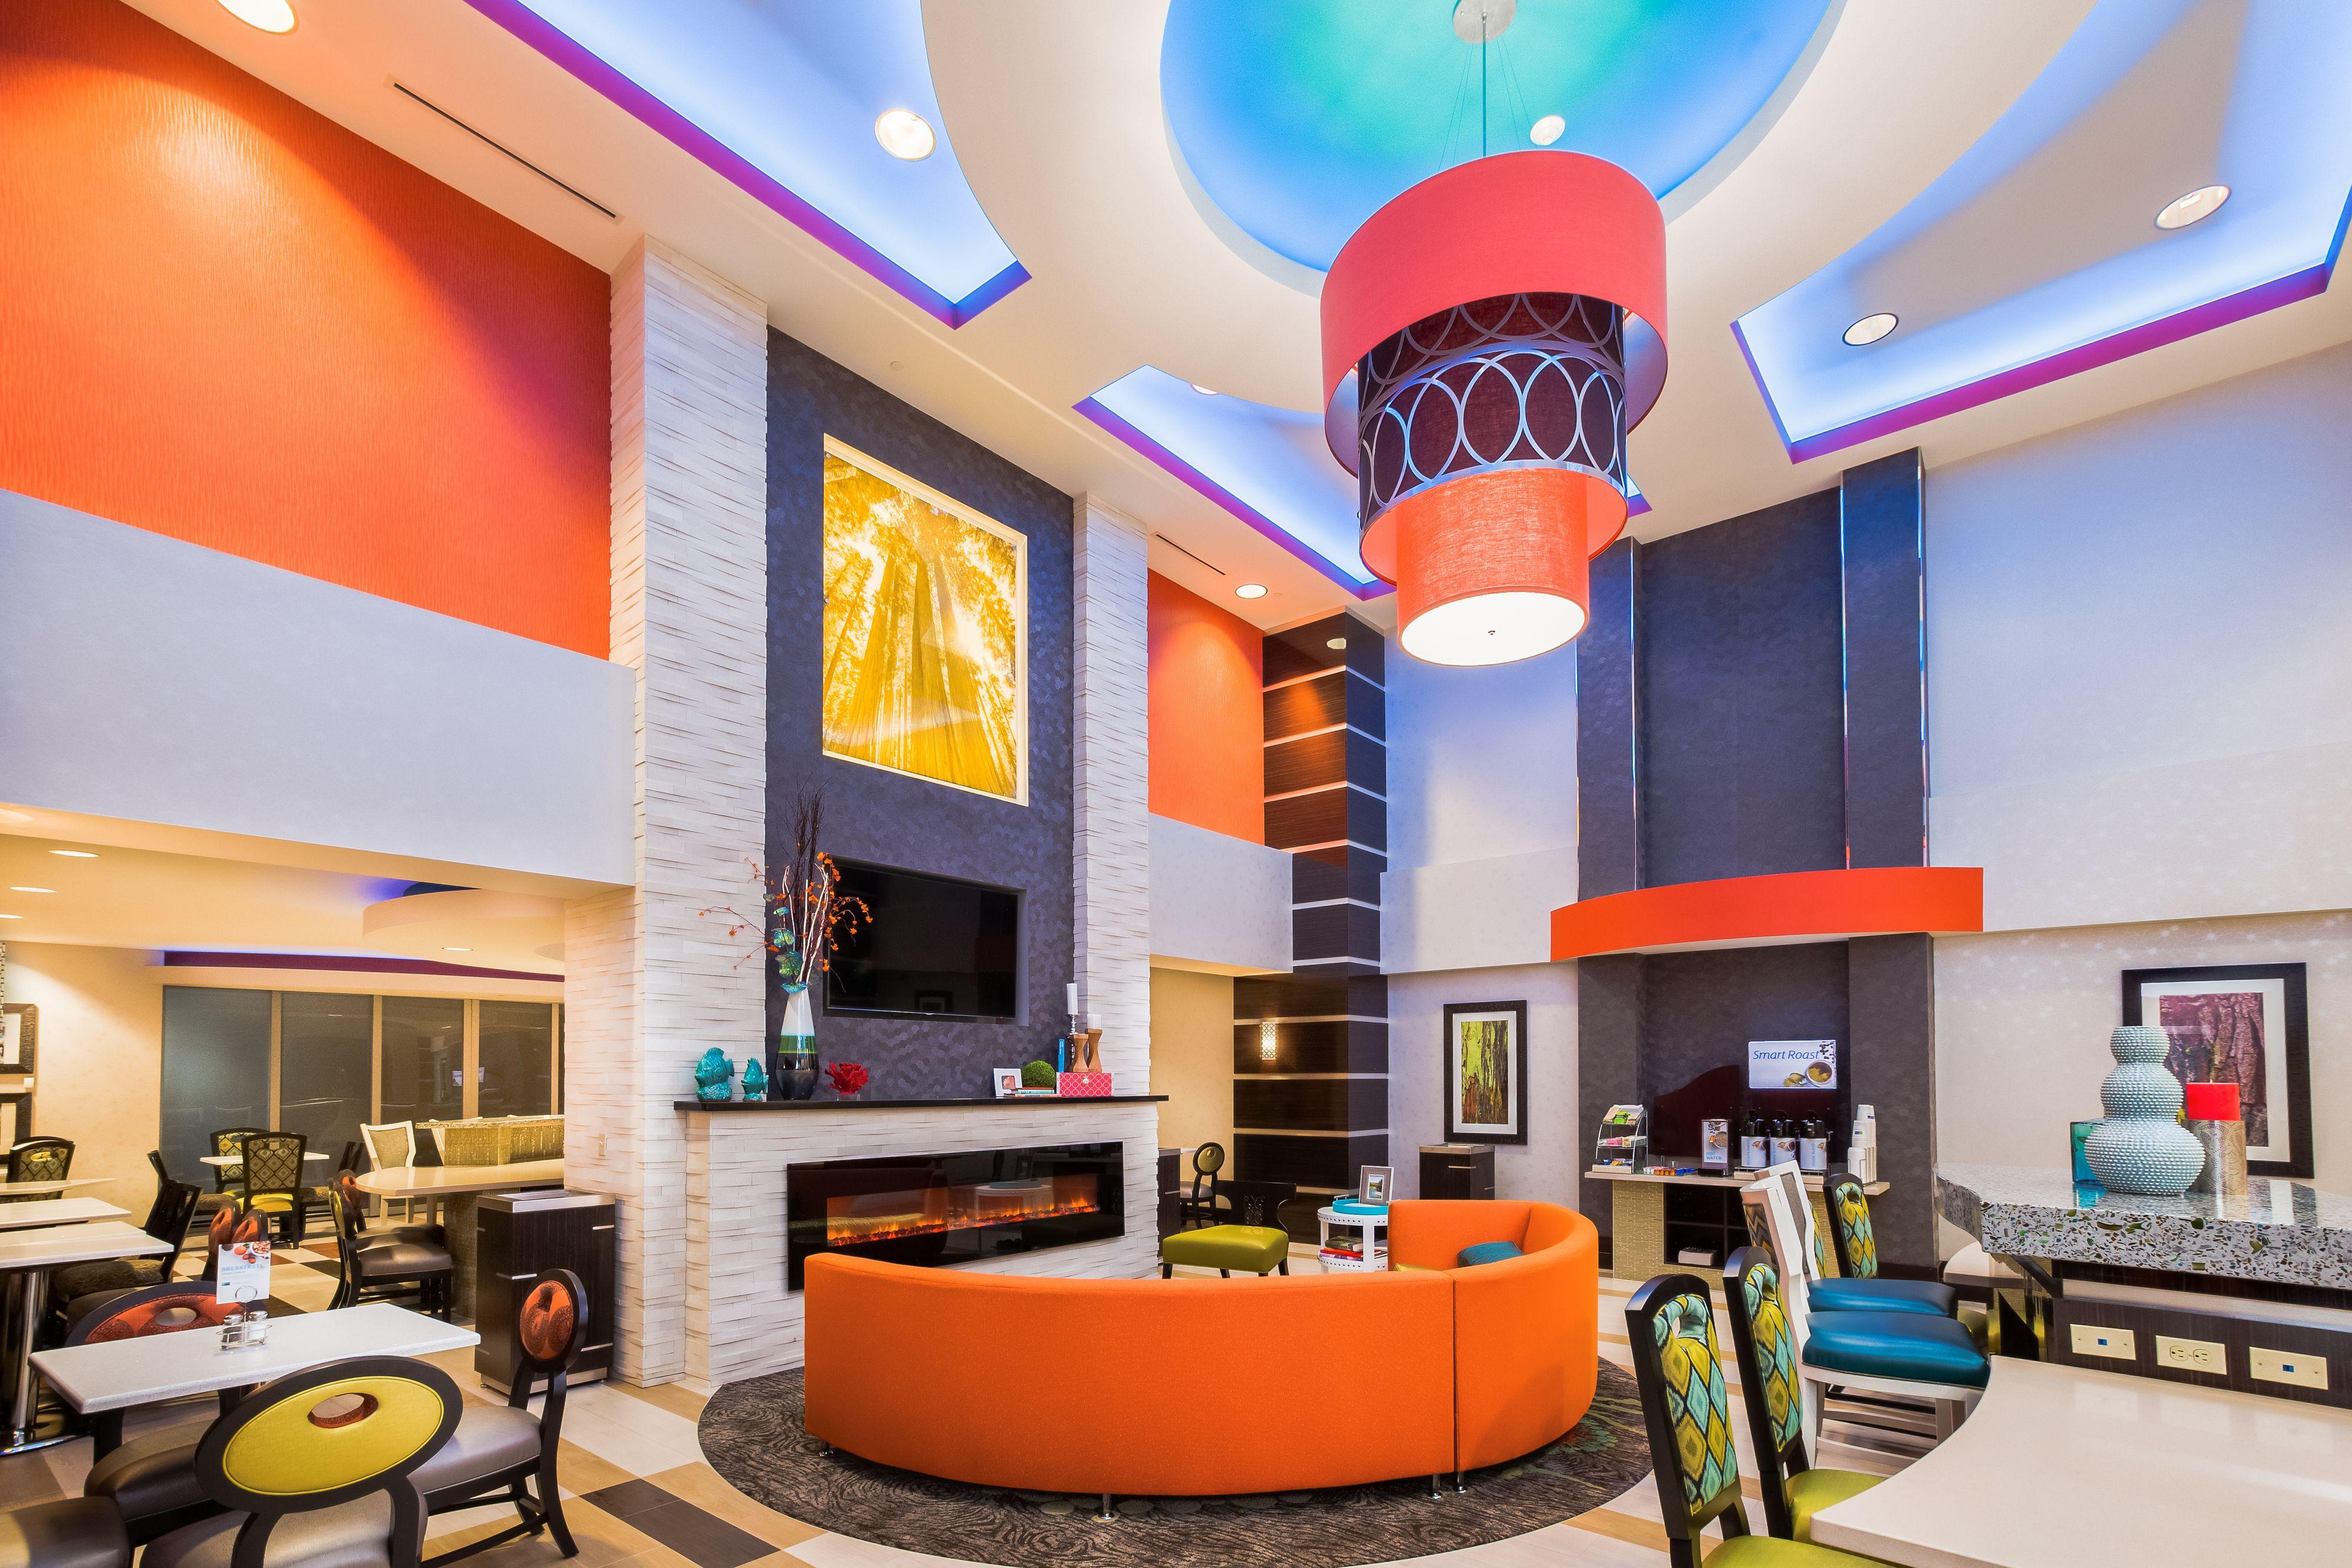 Holiday Inn Express & Suites Eureka image 5